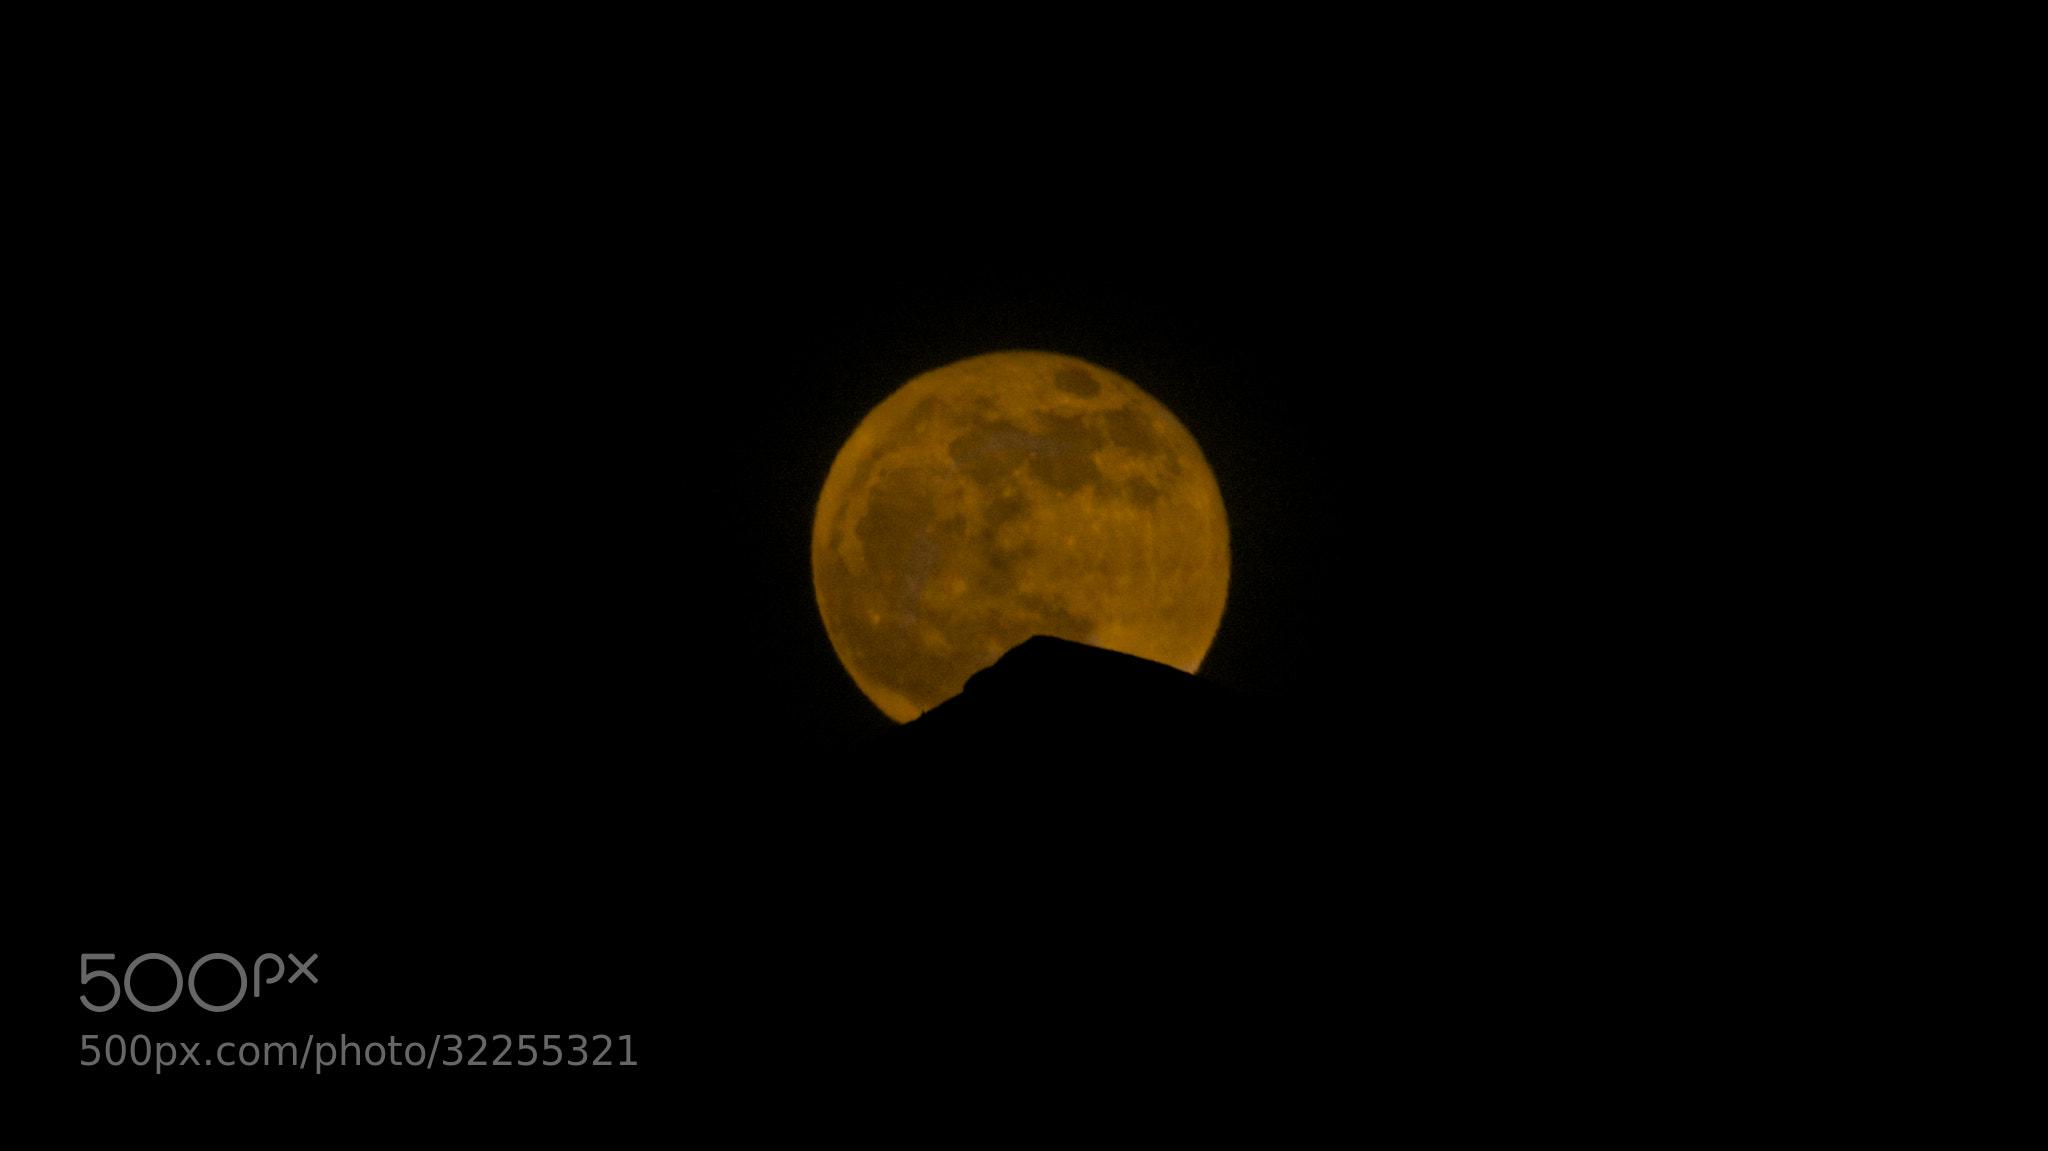 Photograph Luminous by Landon Ketterer on 500px